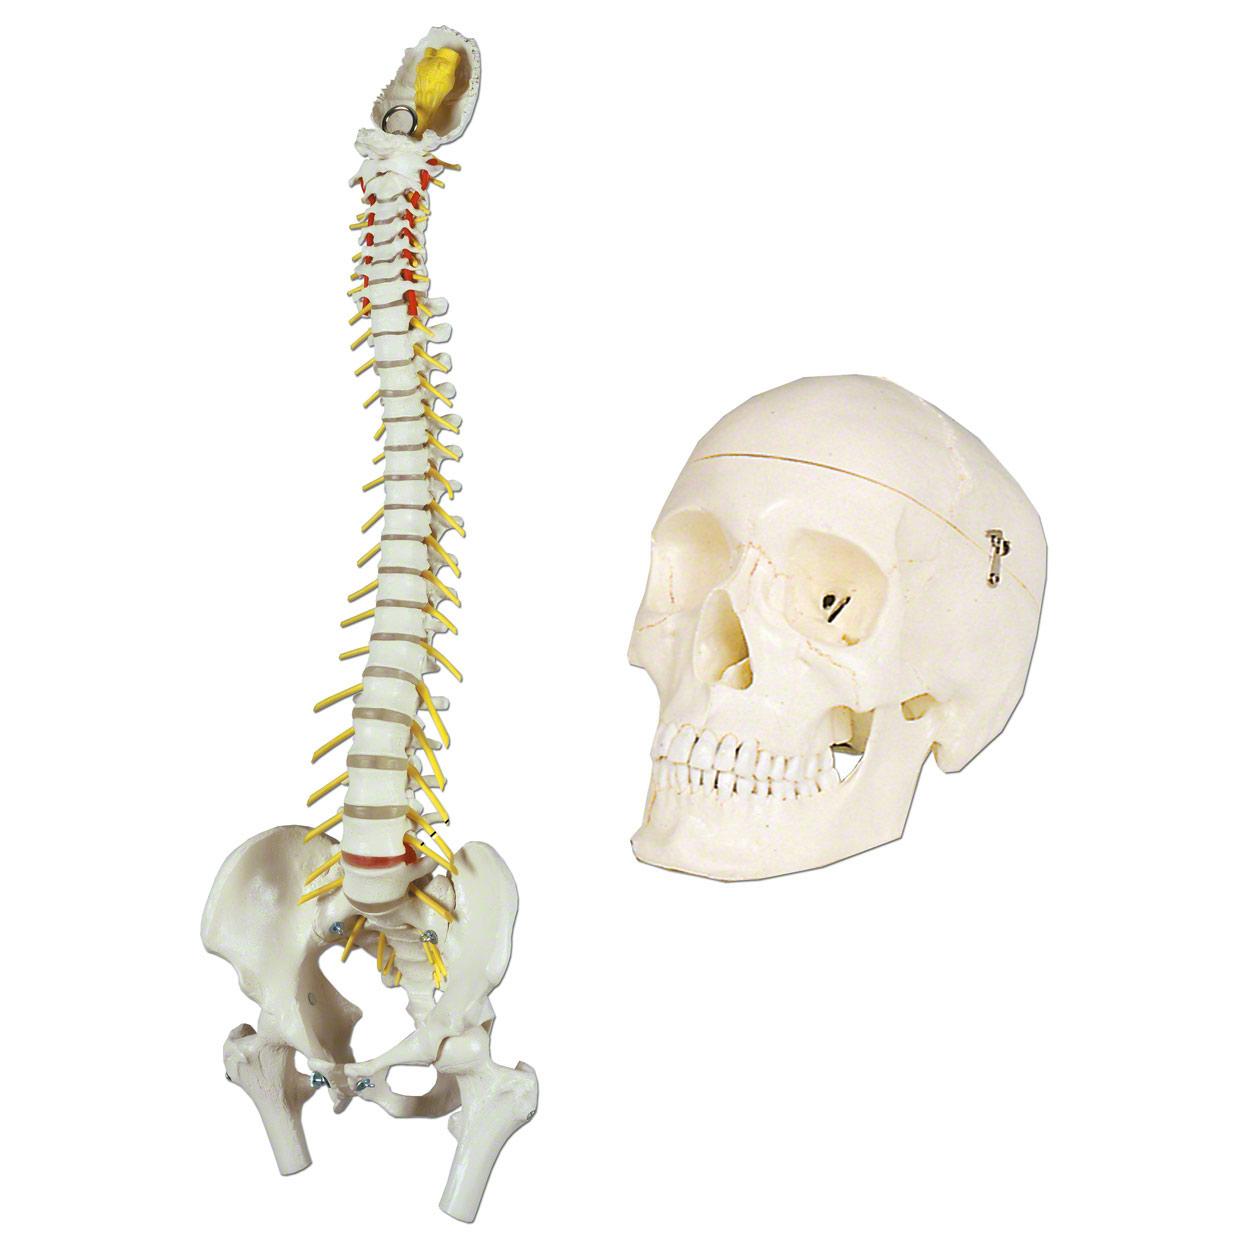 Anatomy Set Skull And Spine 2 Pcs Buy Online Sport Tec